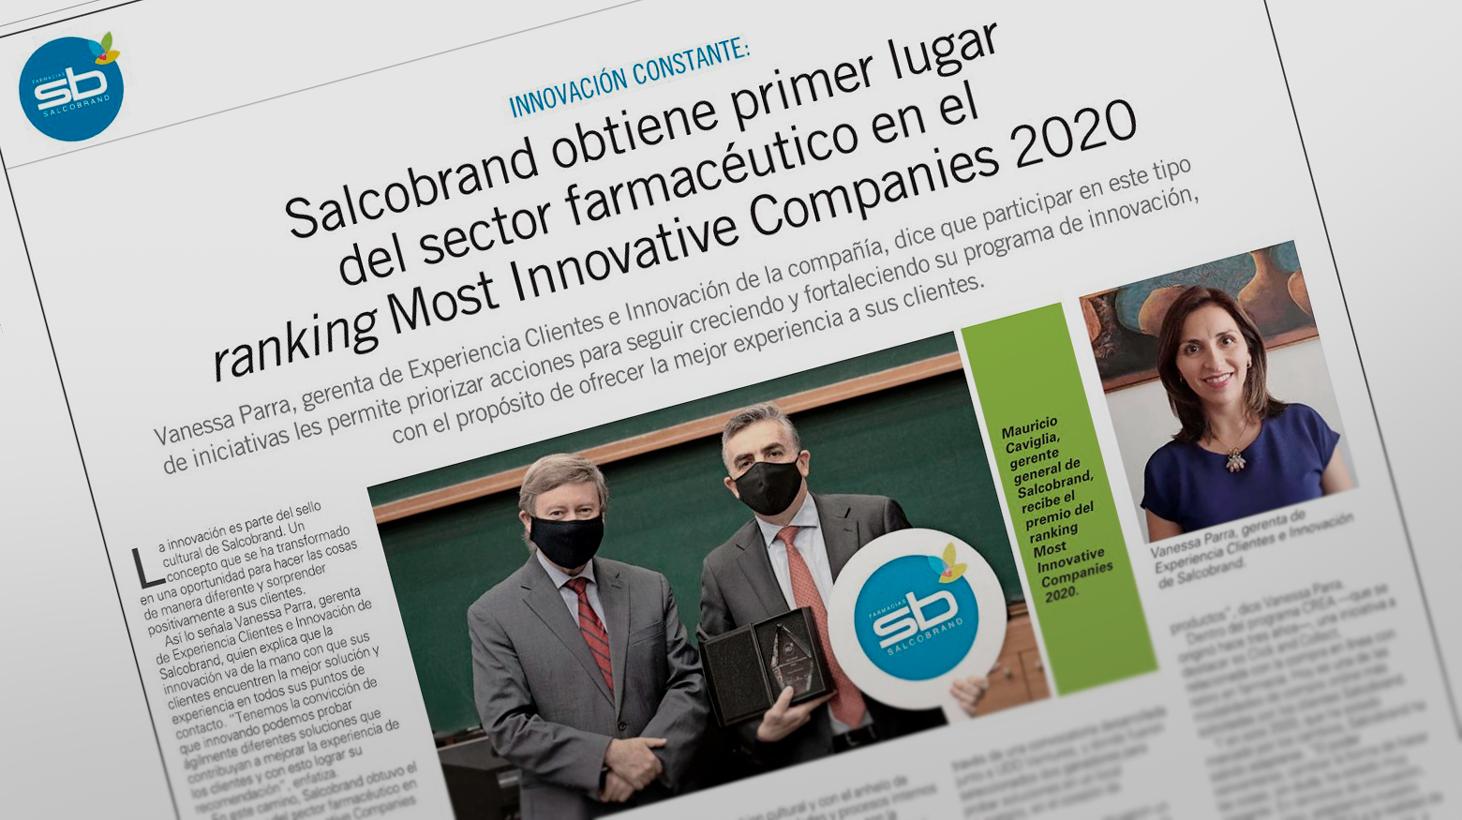 Salcobrand obtiene primer lugar en ranking Most Innovative Companies 2020.